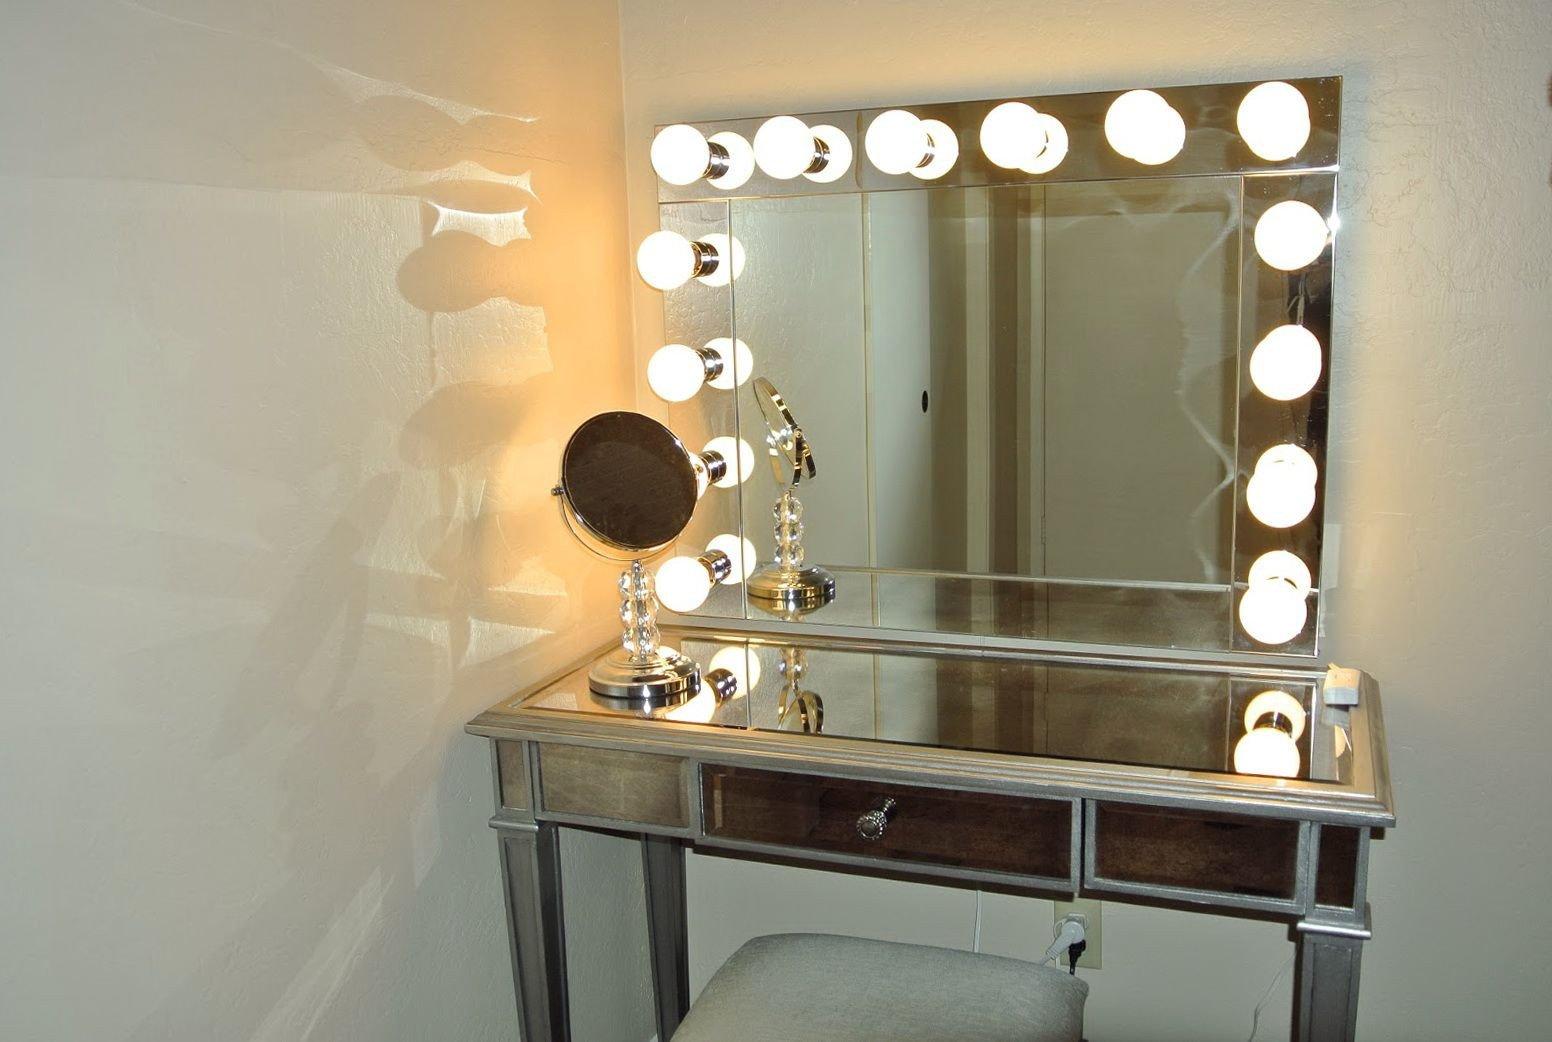 Bedroom Vanity with Light Fresh Vanity Girl Hollywood Mirror Silver